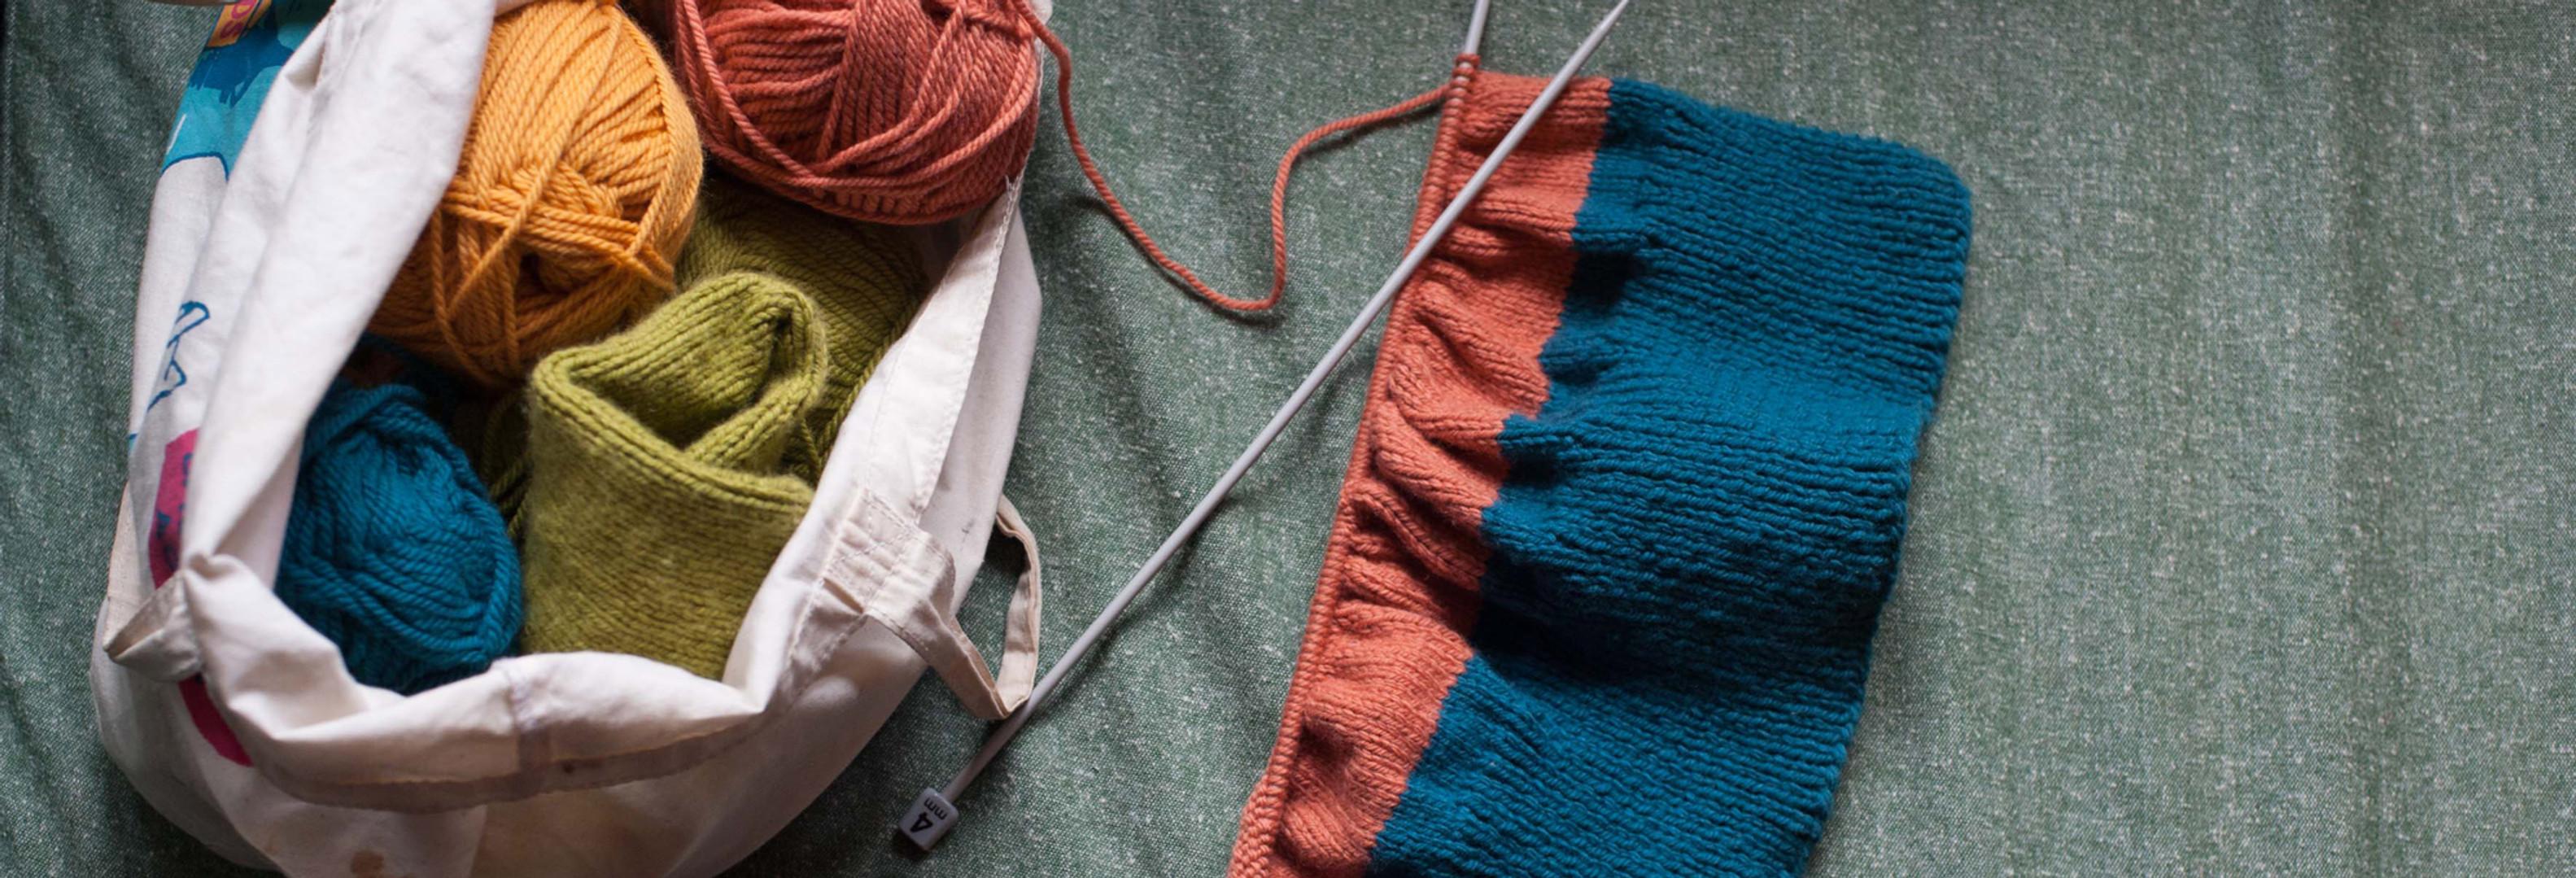 Millpost Merino Knitted.jpg